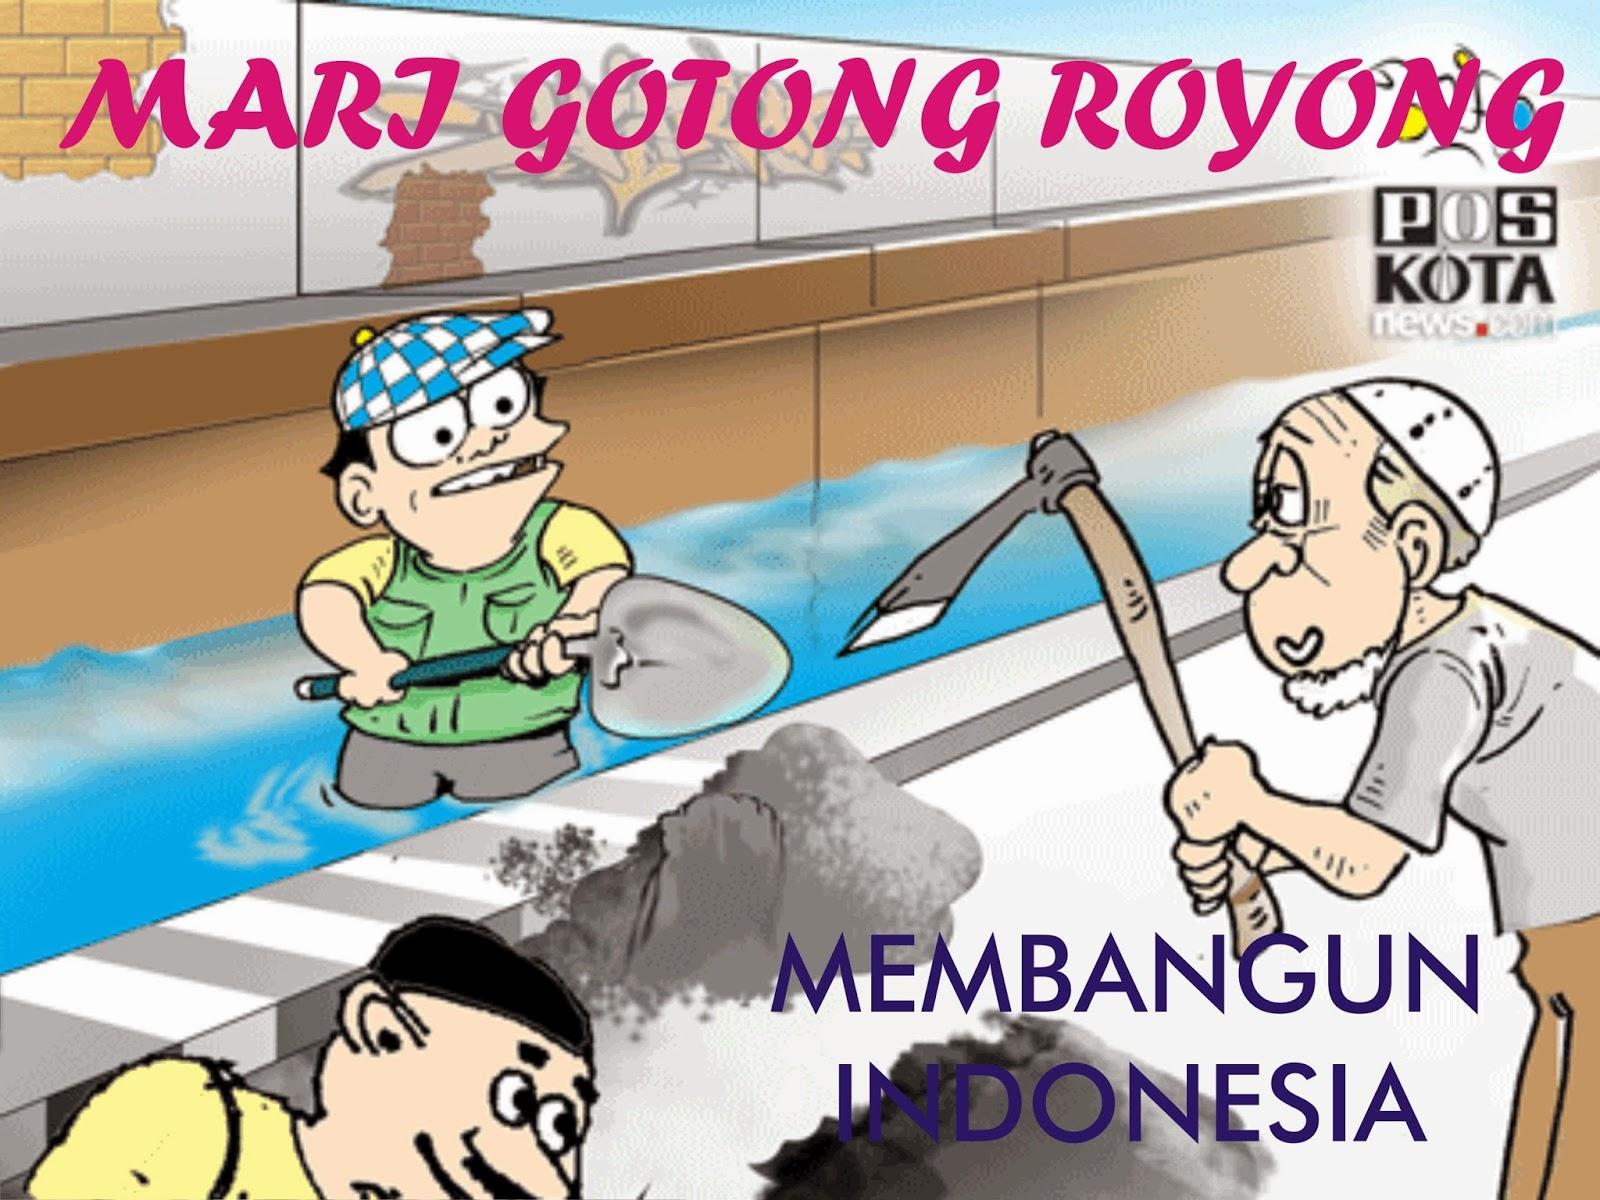 Gambar Gotong Royong Di Sekolah Kartun Bestkartun